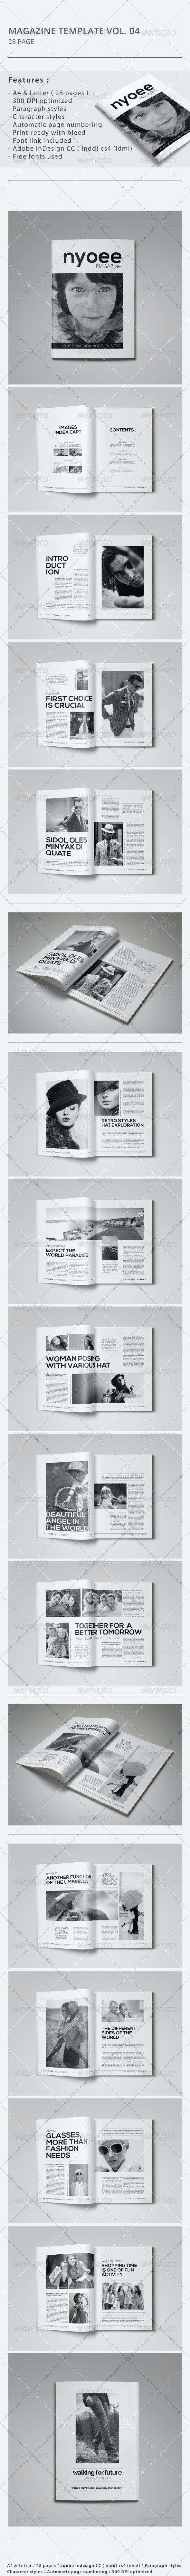 Indesign Magazine Template Vol.04 - Magazines Print Templates